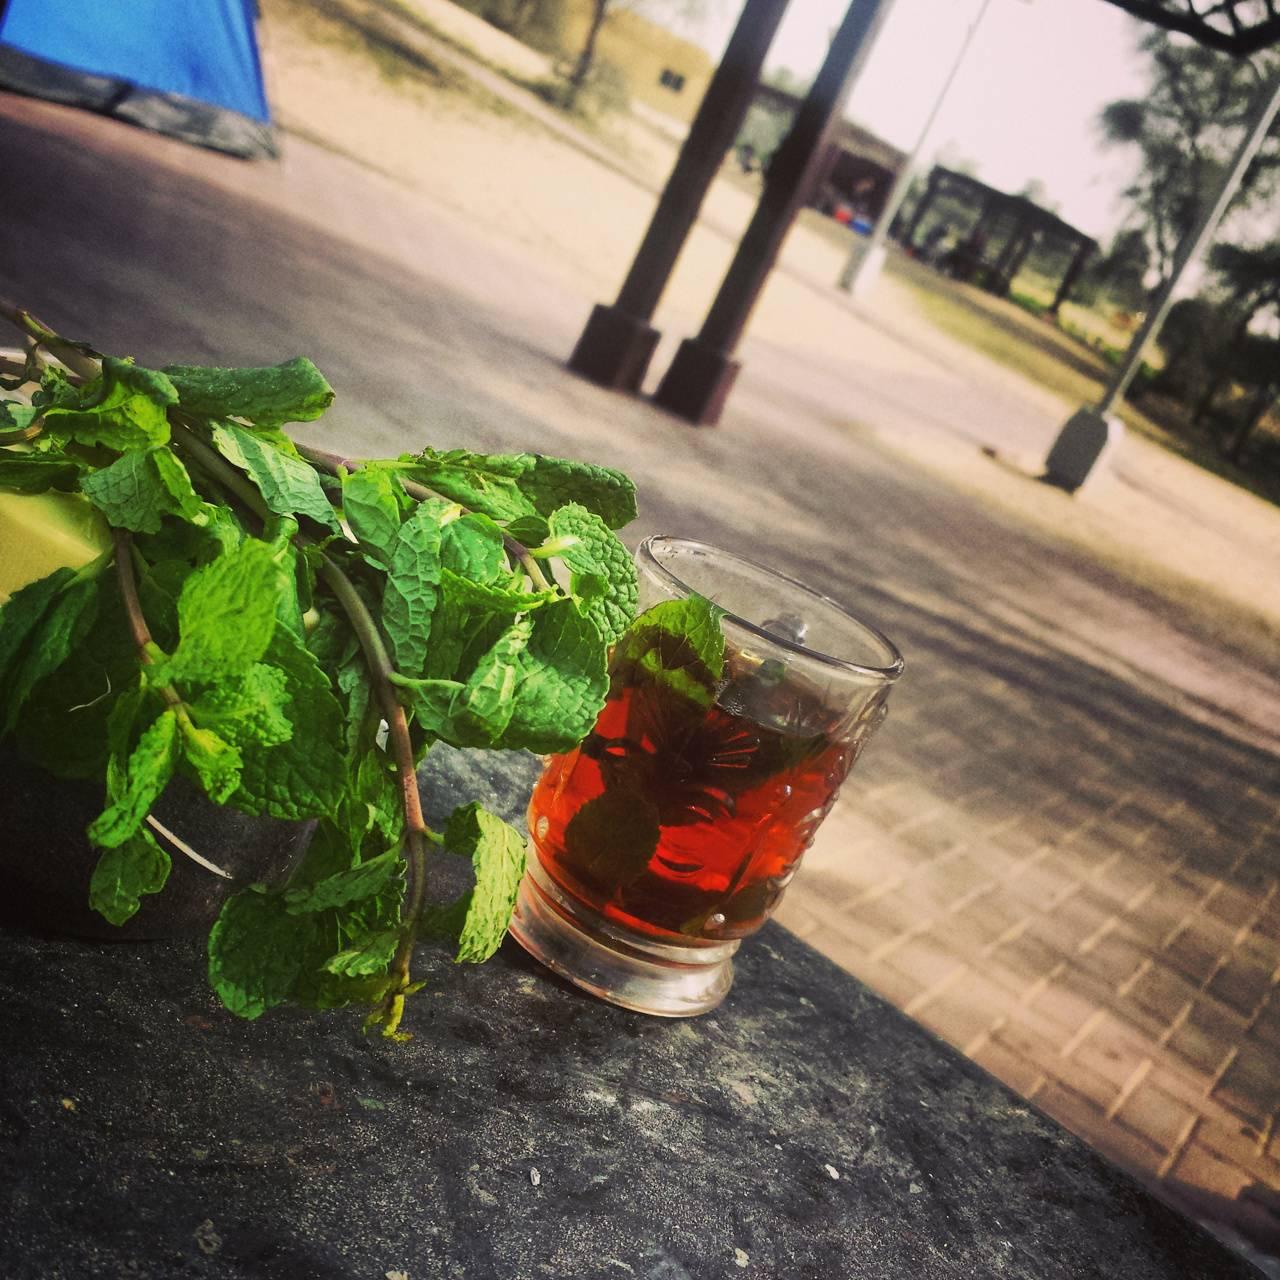 Red tea